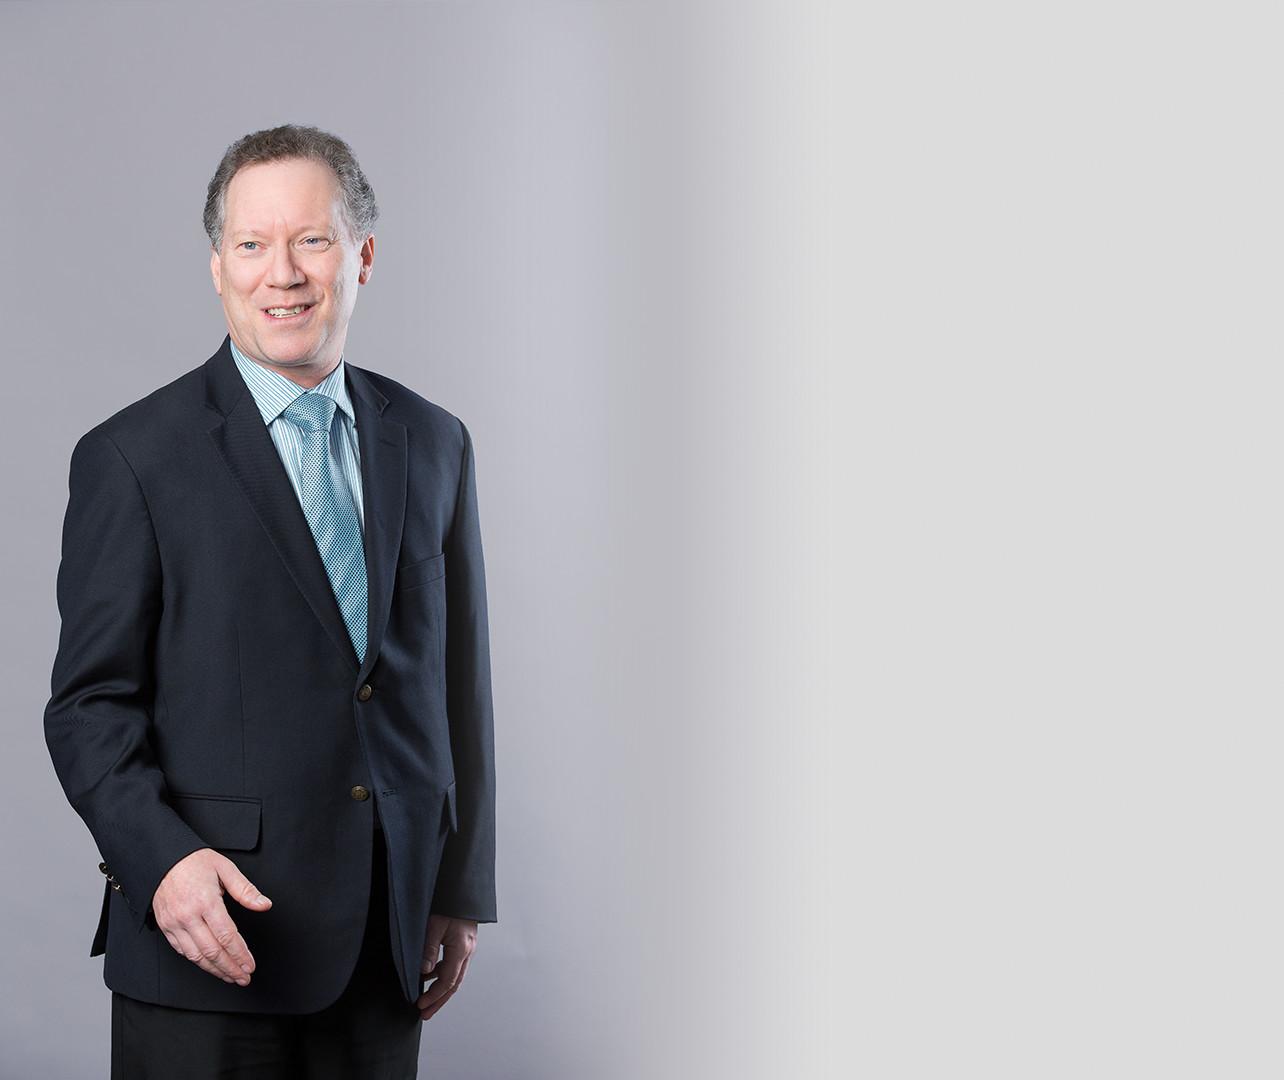 Daniel Burnett - Media Lawyer, Defamation Law | Vancouver, BC